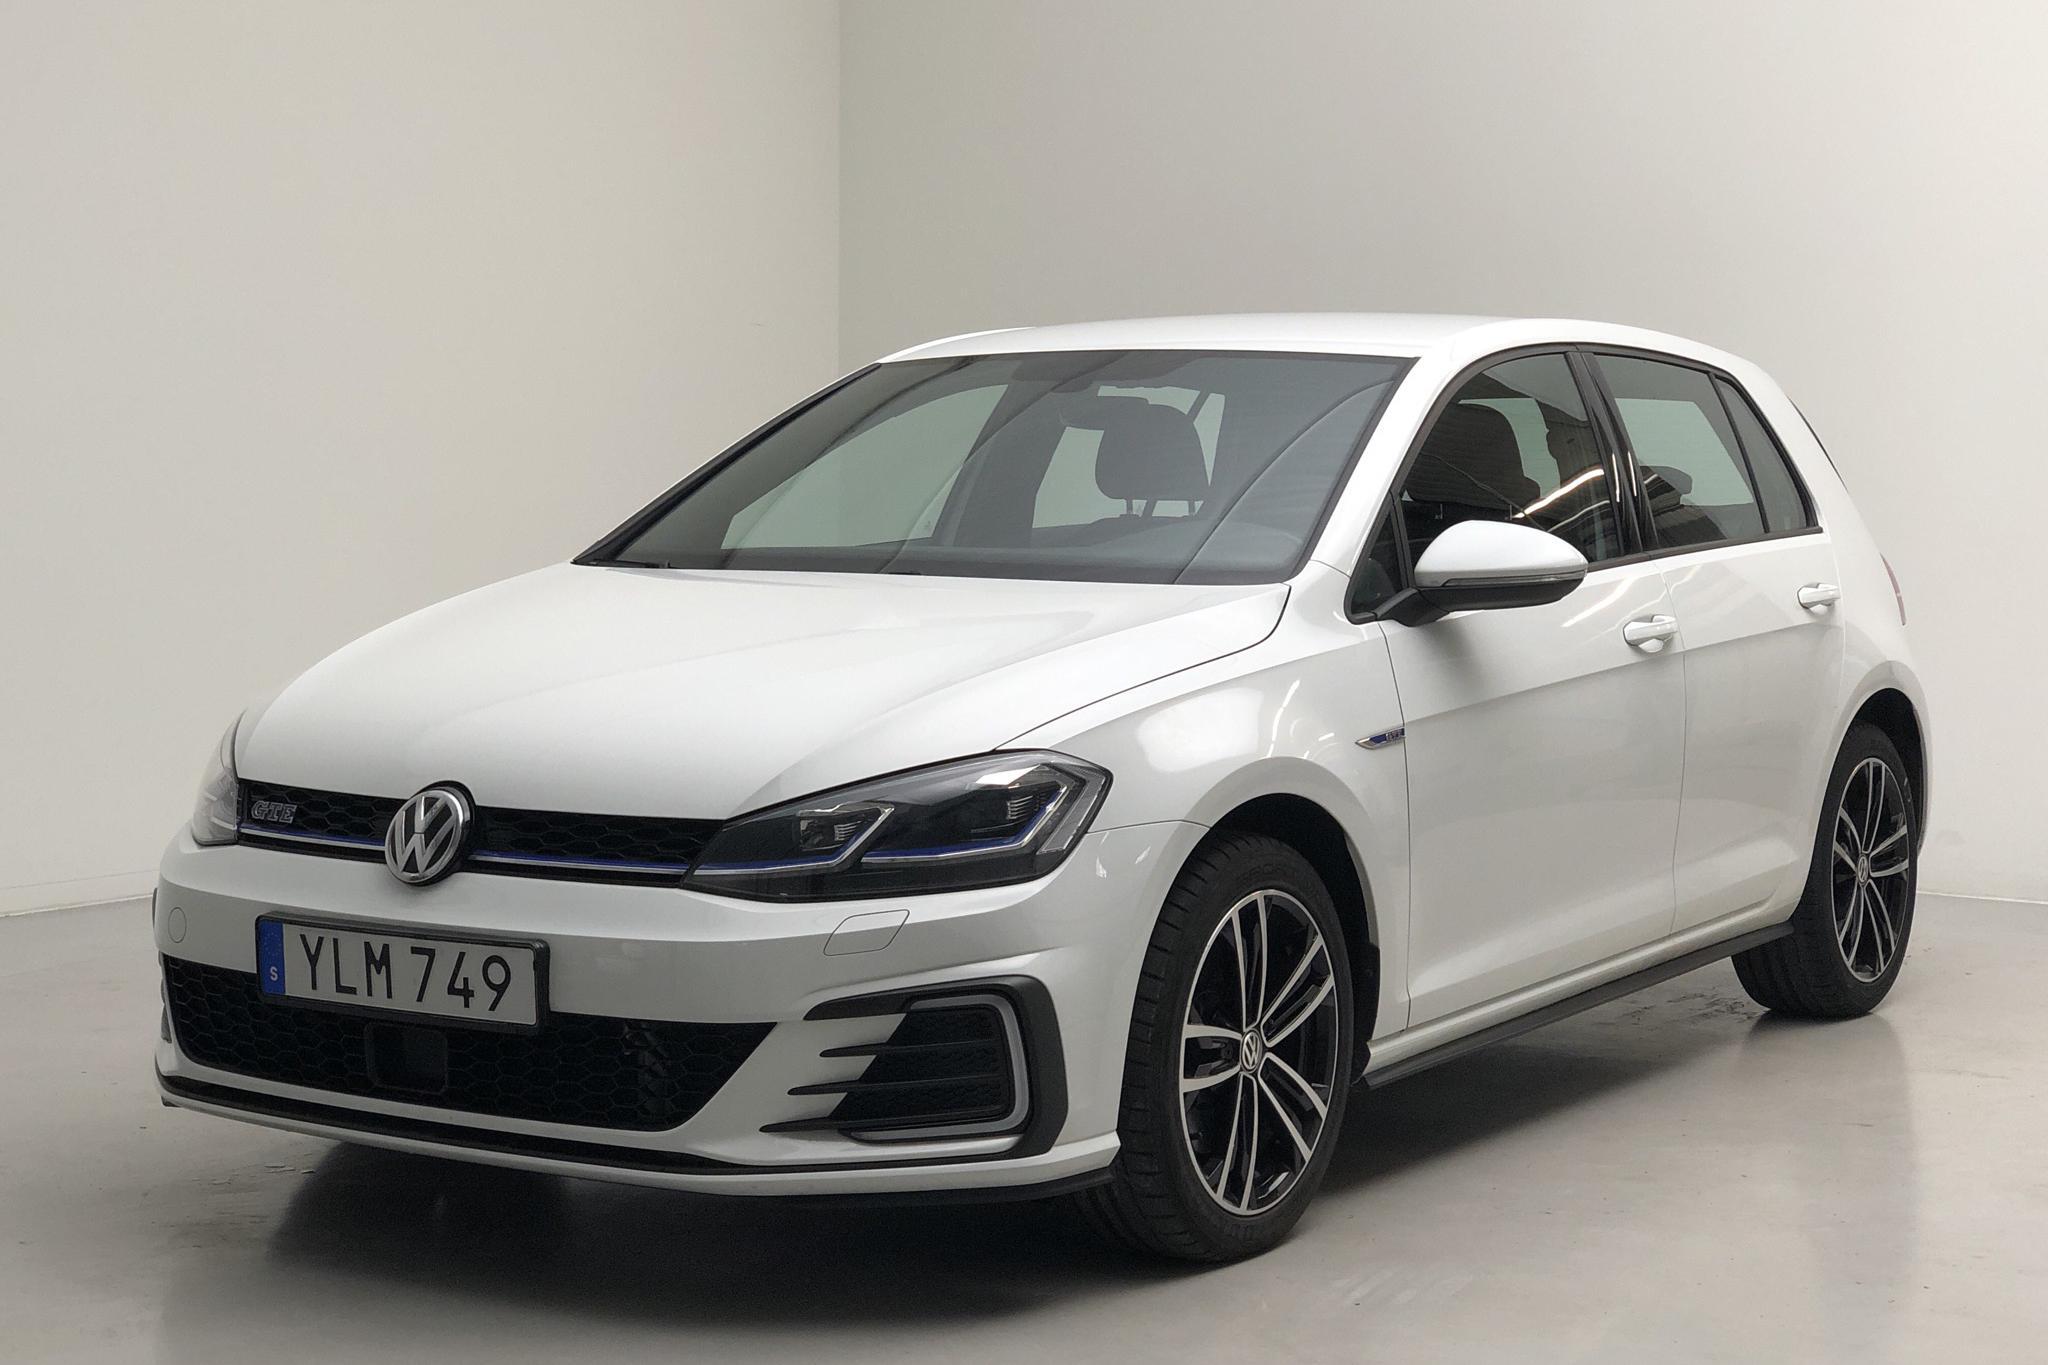 VW Golf VII GTE 5dr (204hk) - 39 430 km - Automatic - white - 2017